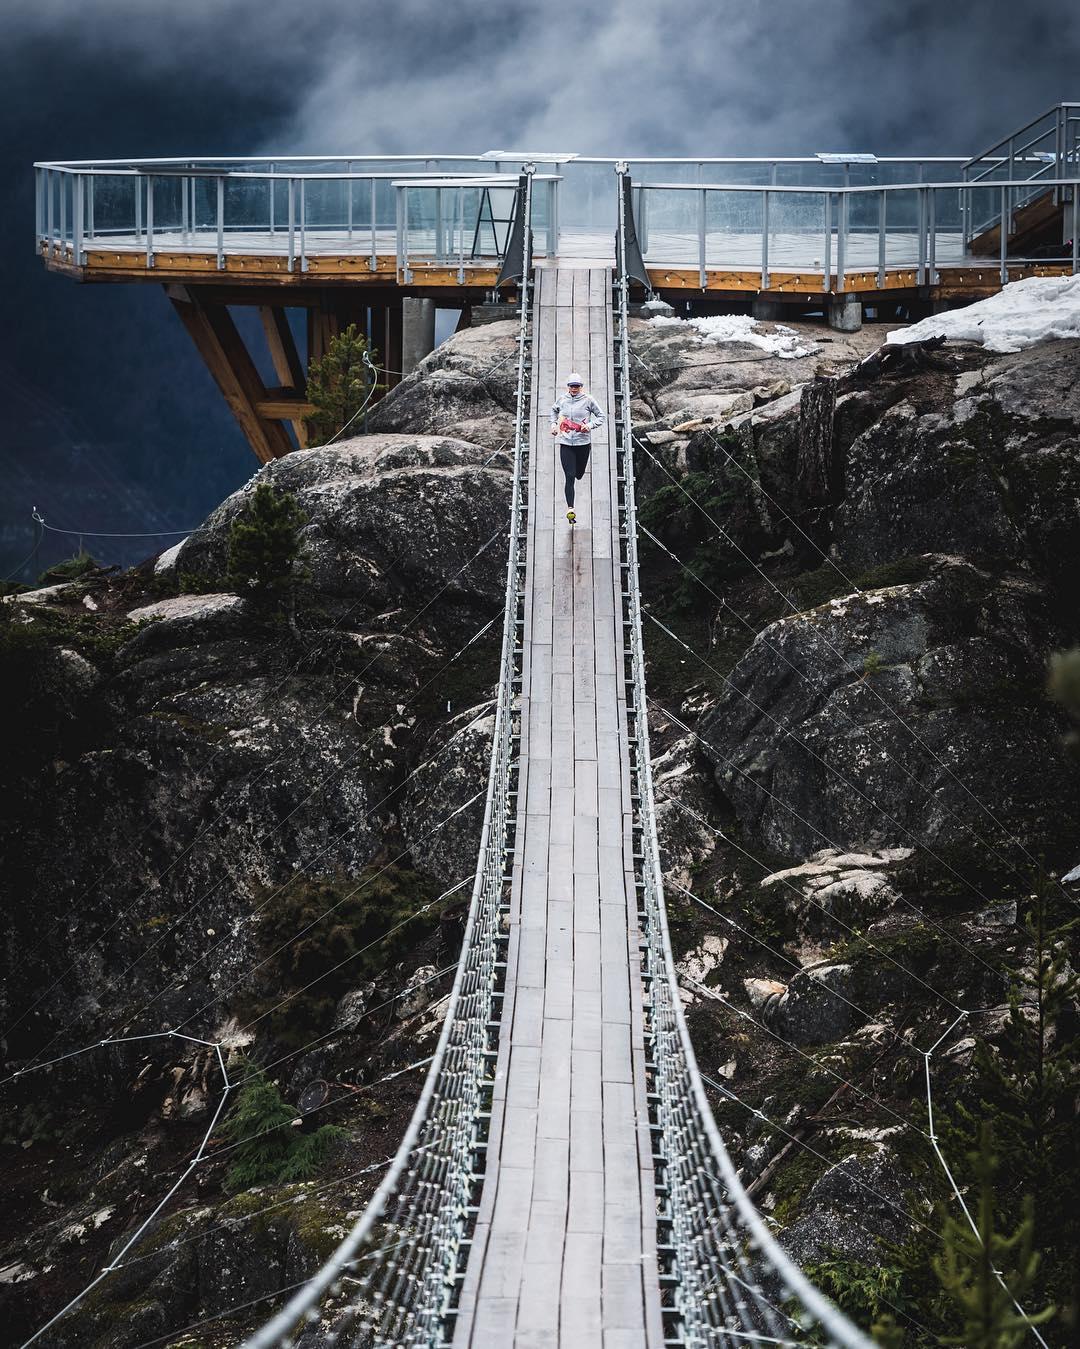 Don't burn bridges, cross them.